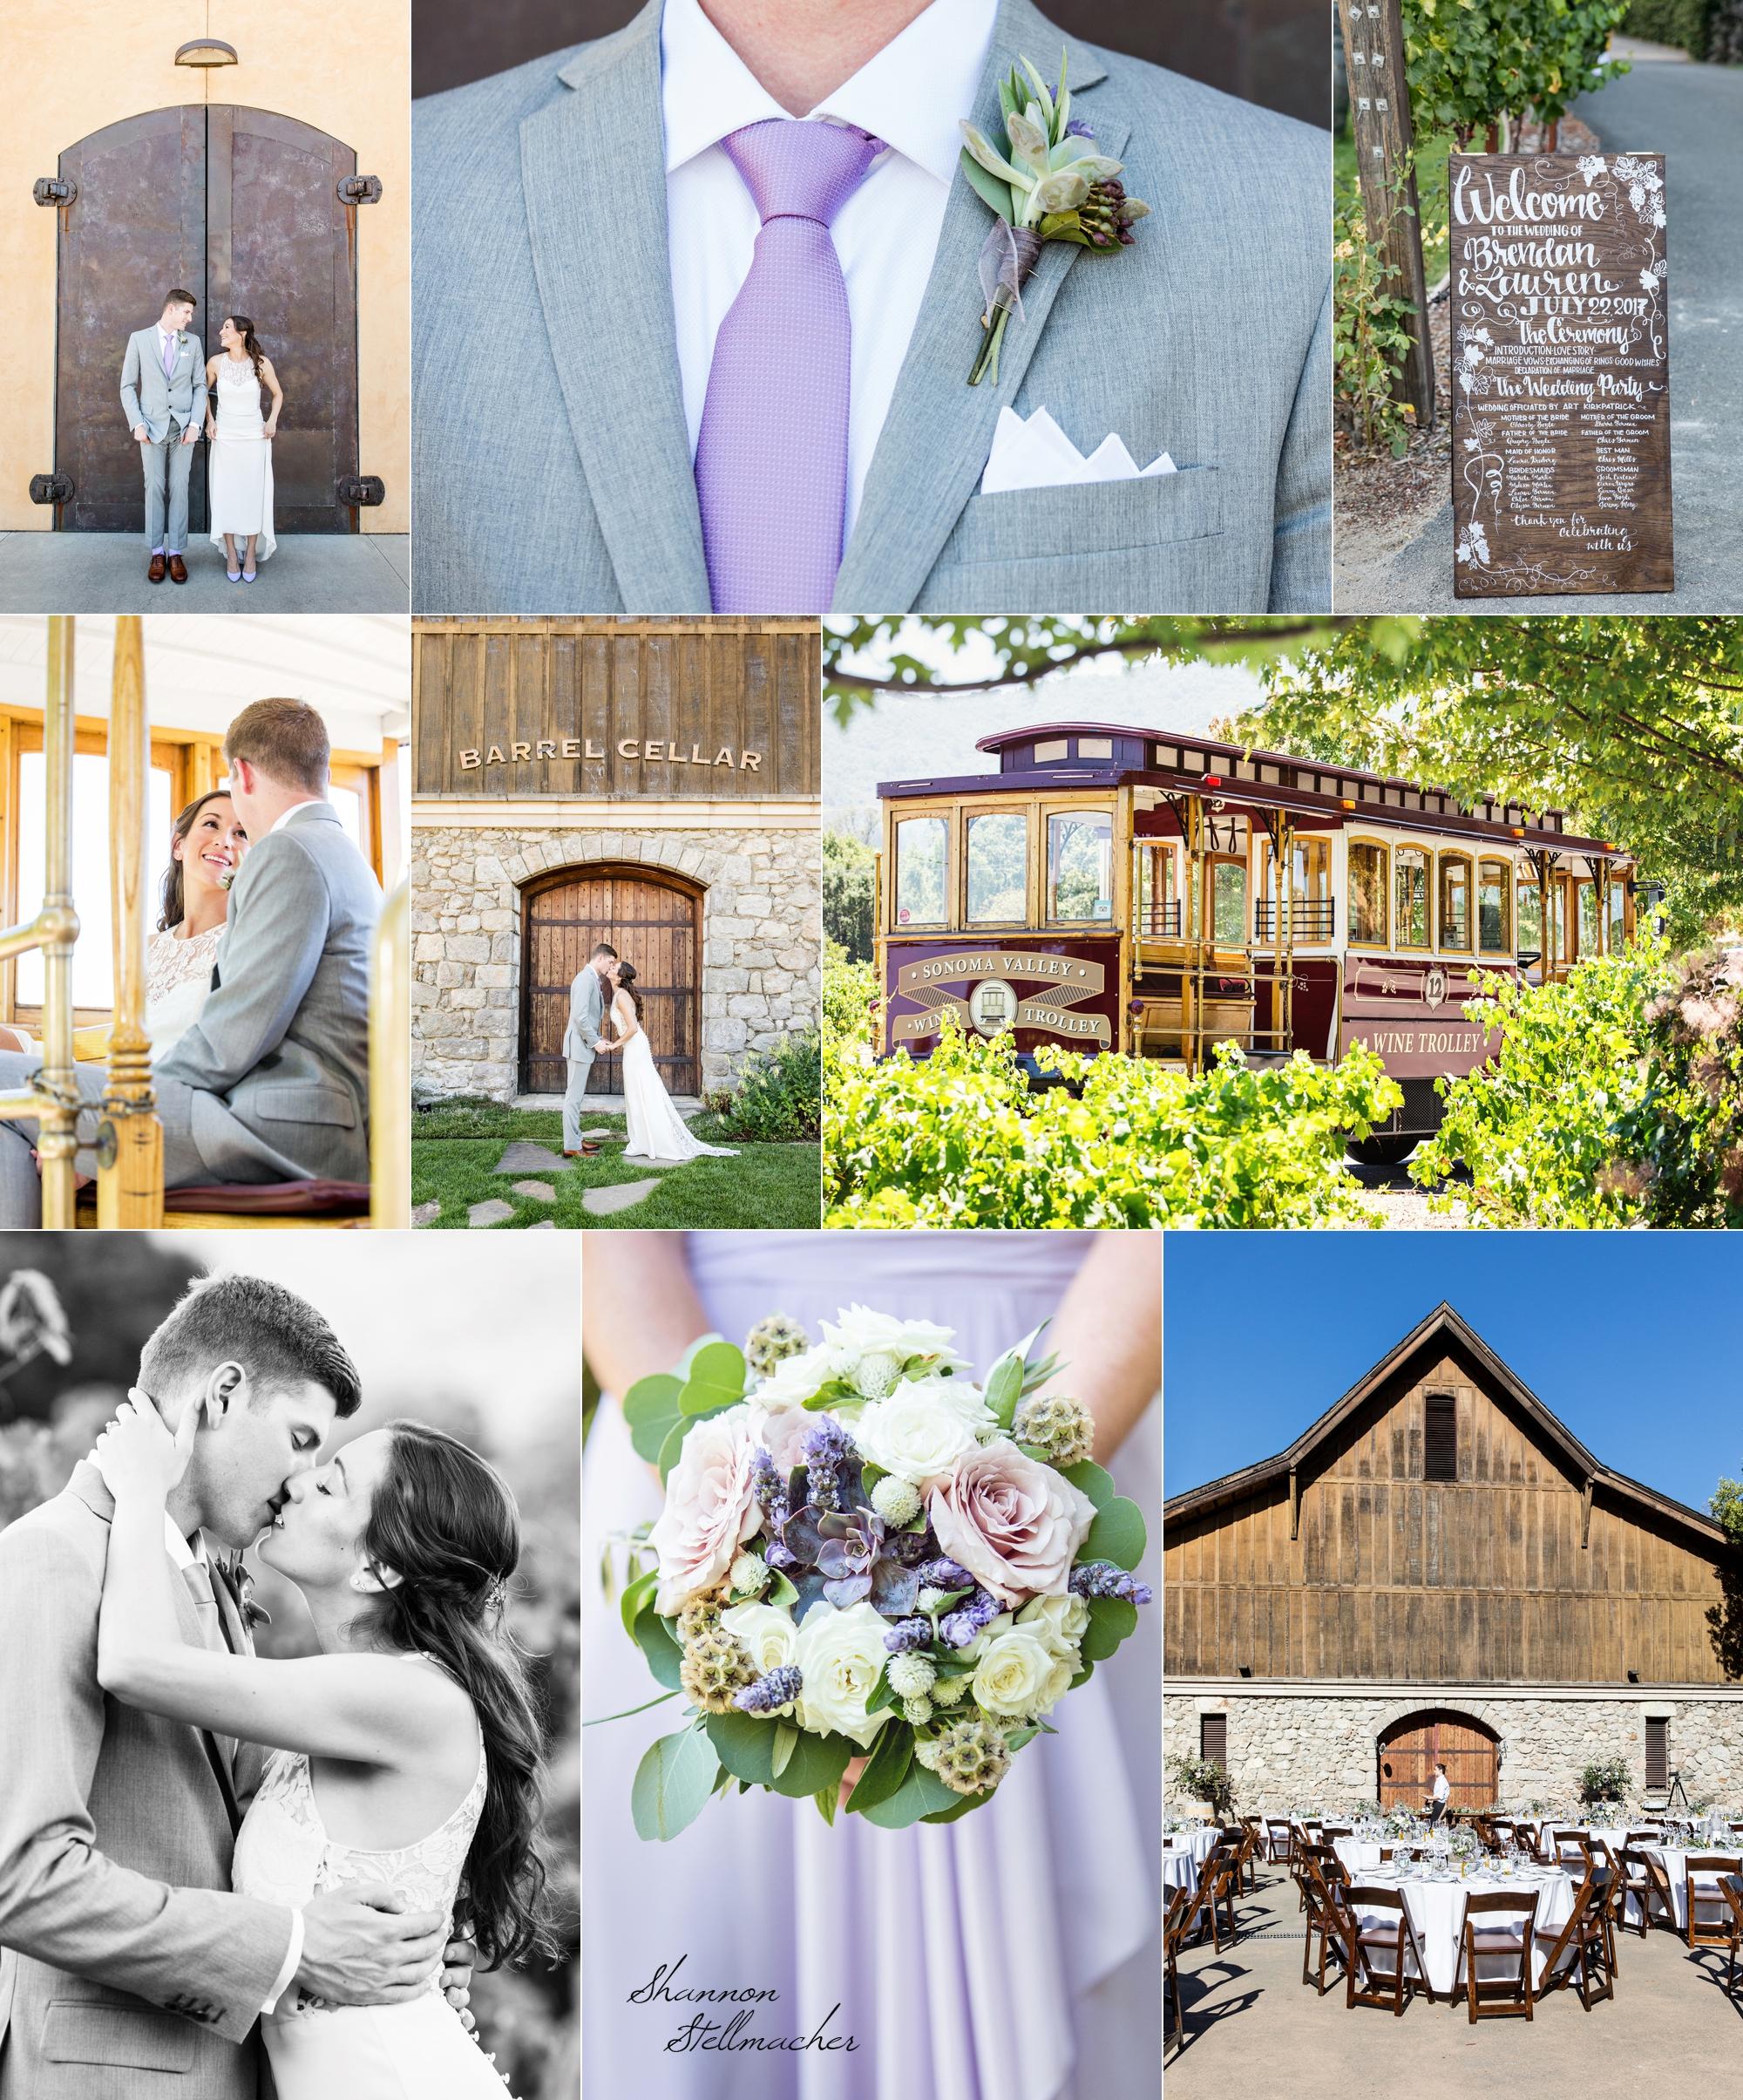 Madrone Estate wedding 1.jpg